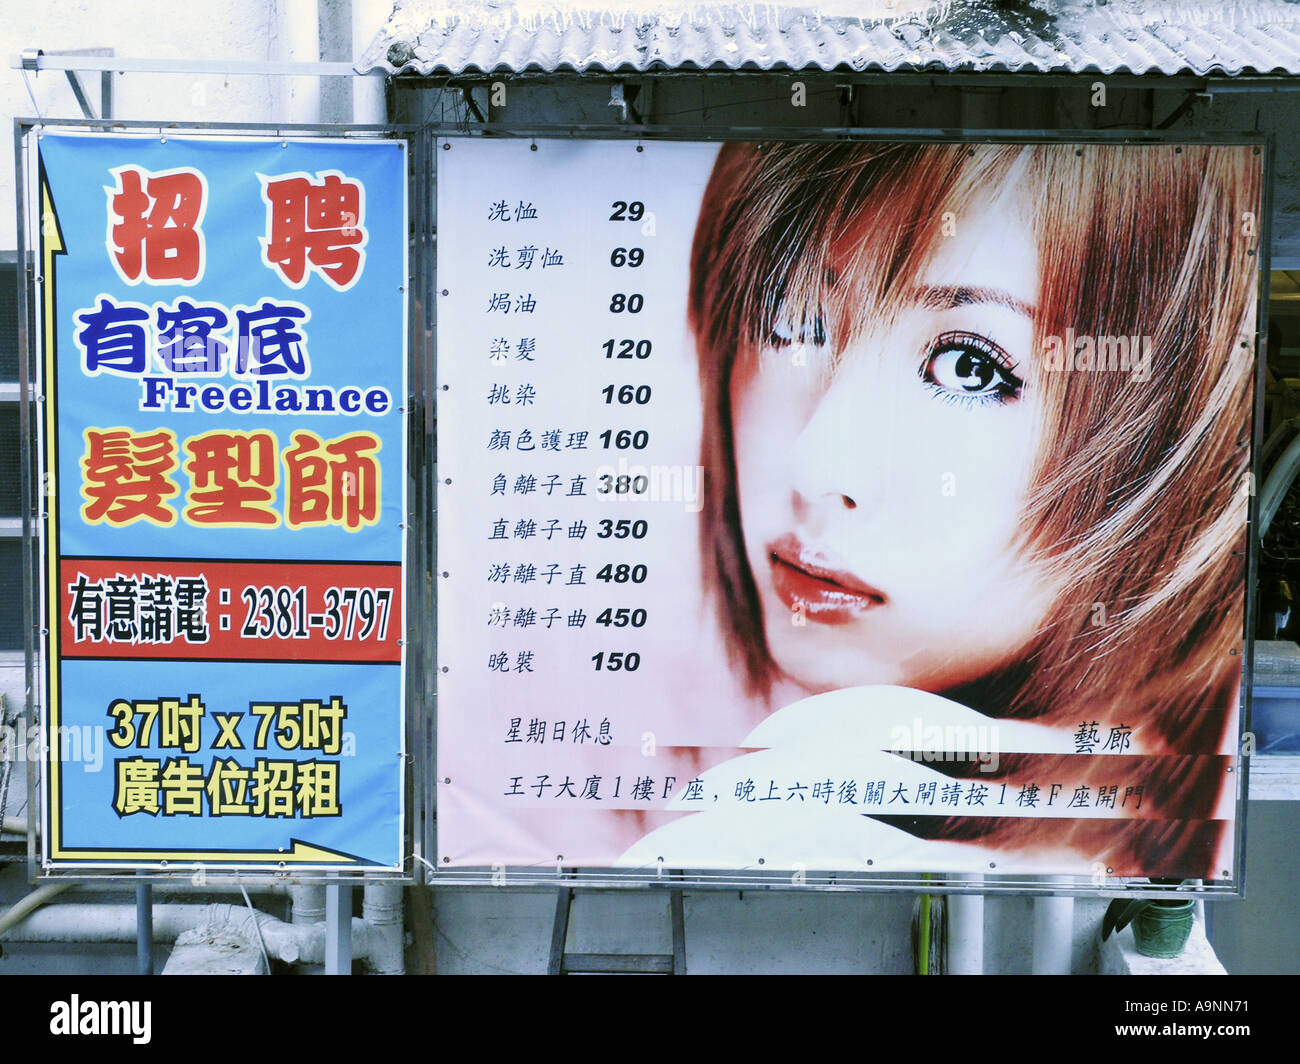 Wanted sign symbol employ employment salon frisuer Mongkok Kowloon Hong Kong china chinese asia asian life price list - Stock Image